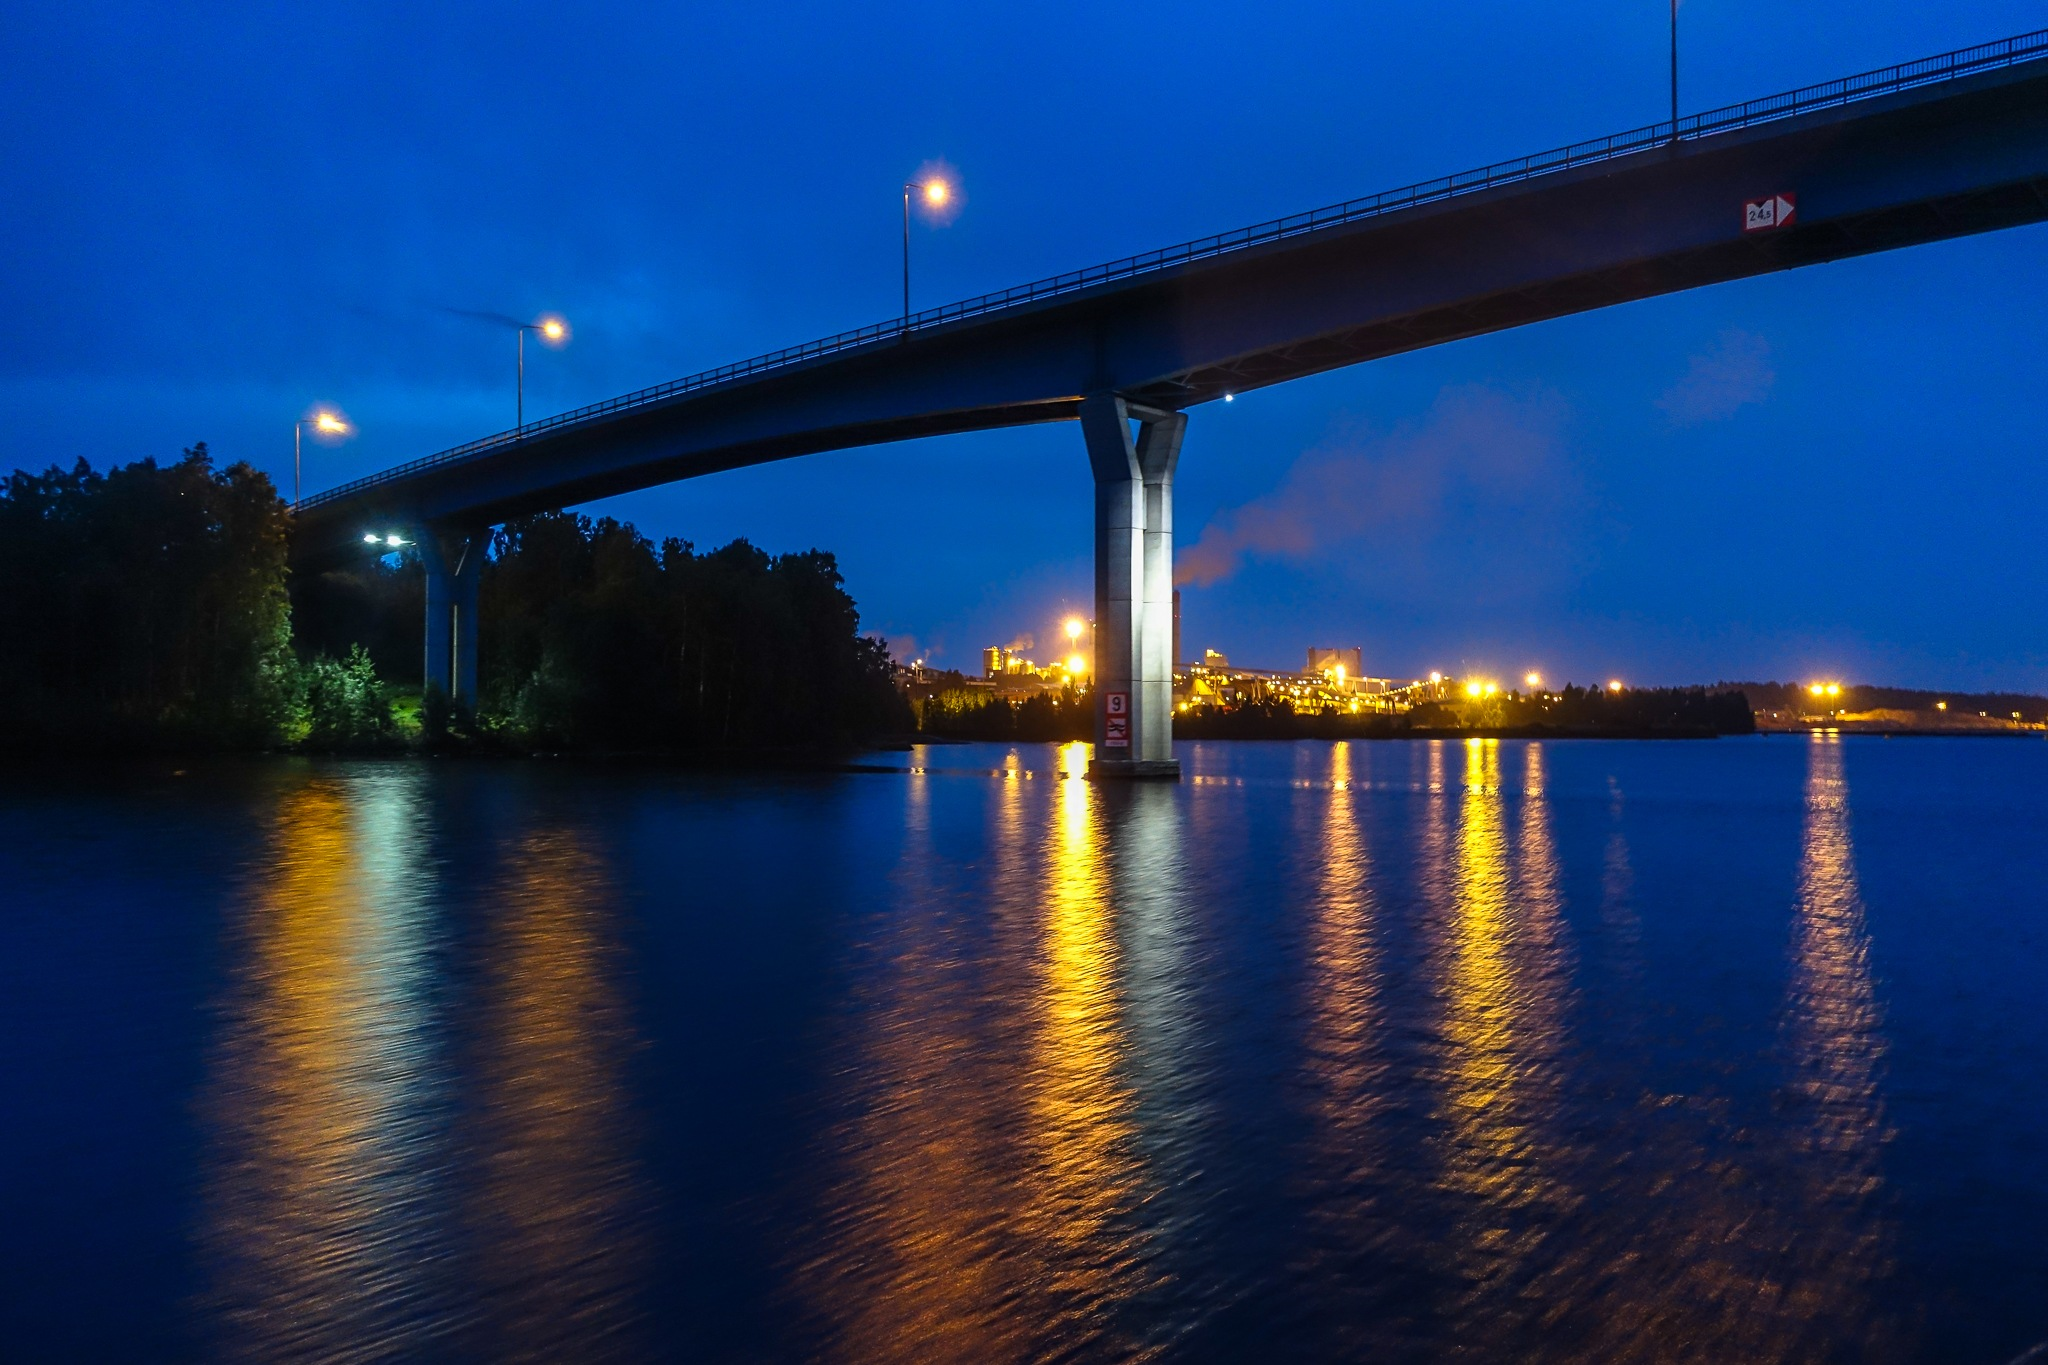 Bridge over Luukkaansalmi by Anne_V